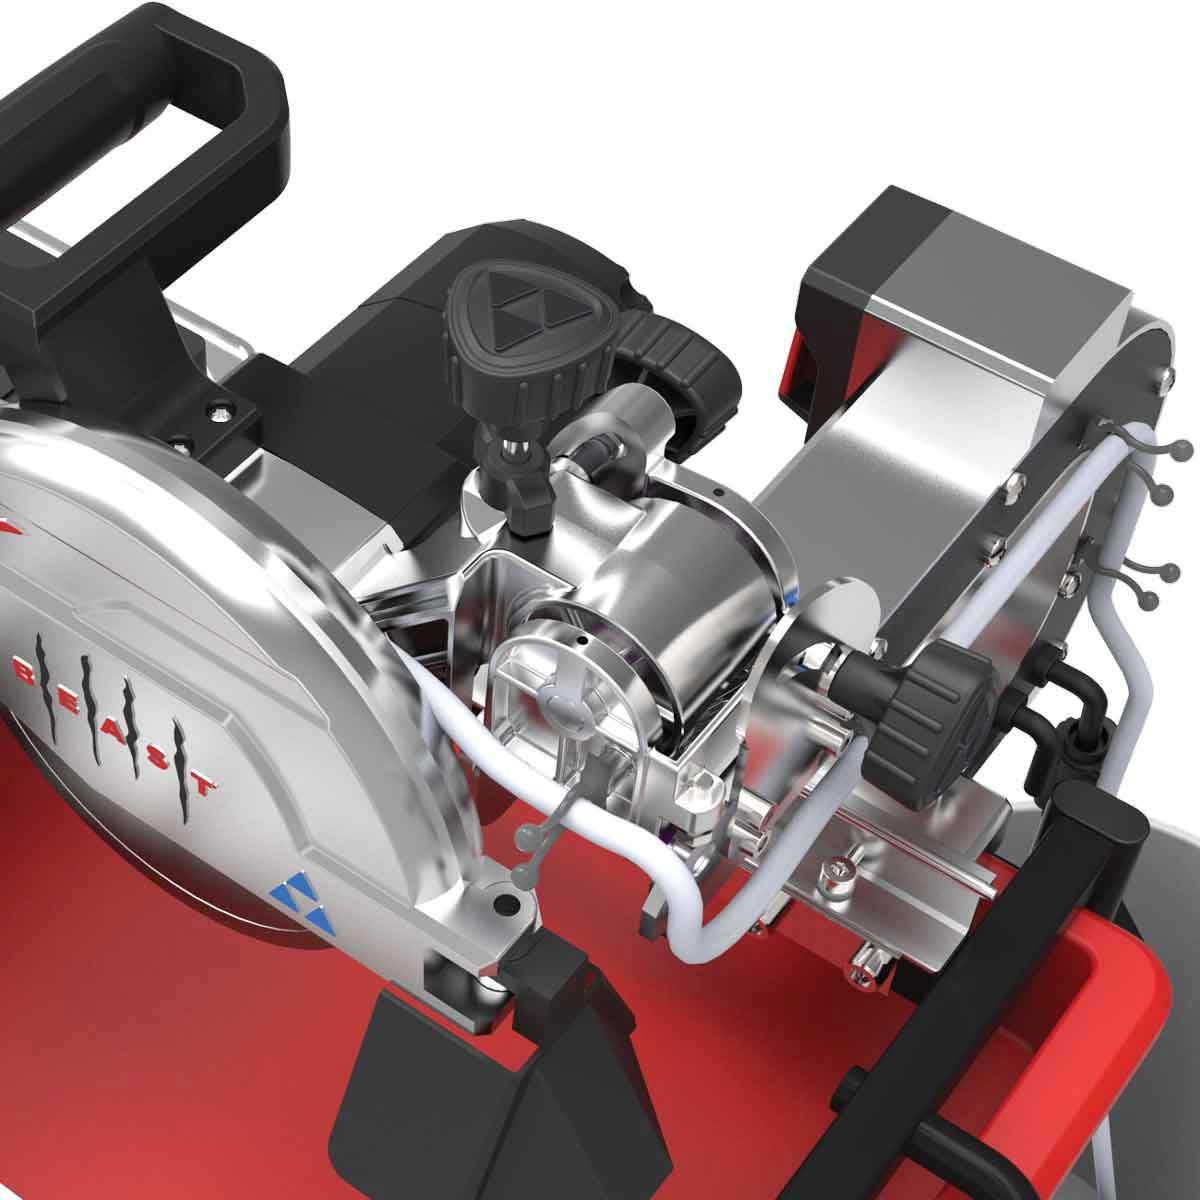 Lackmond Beast7 direct drive motor